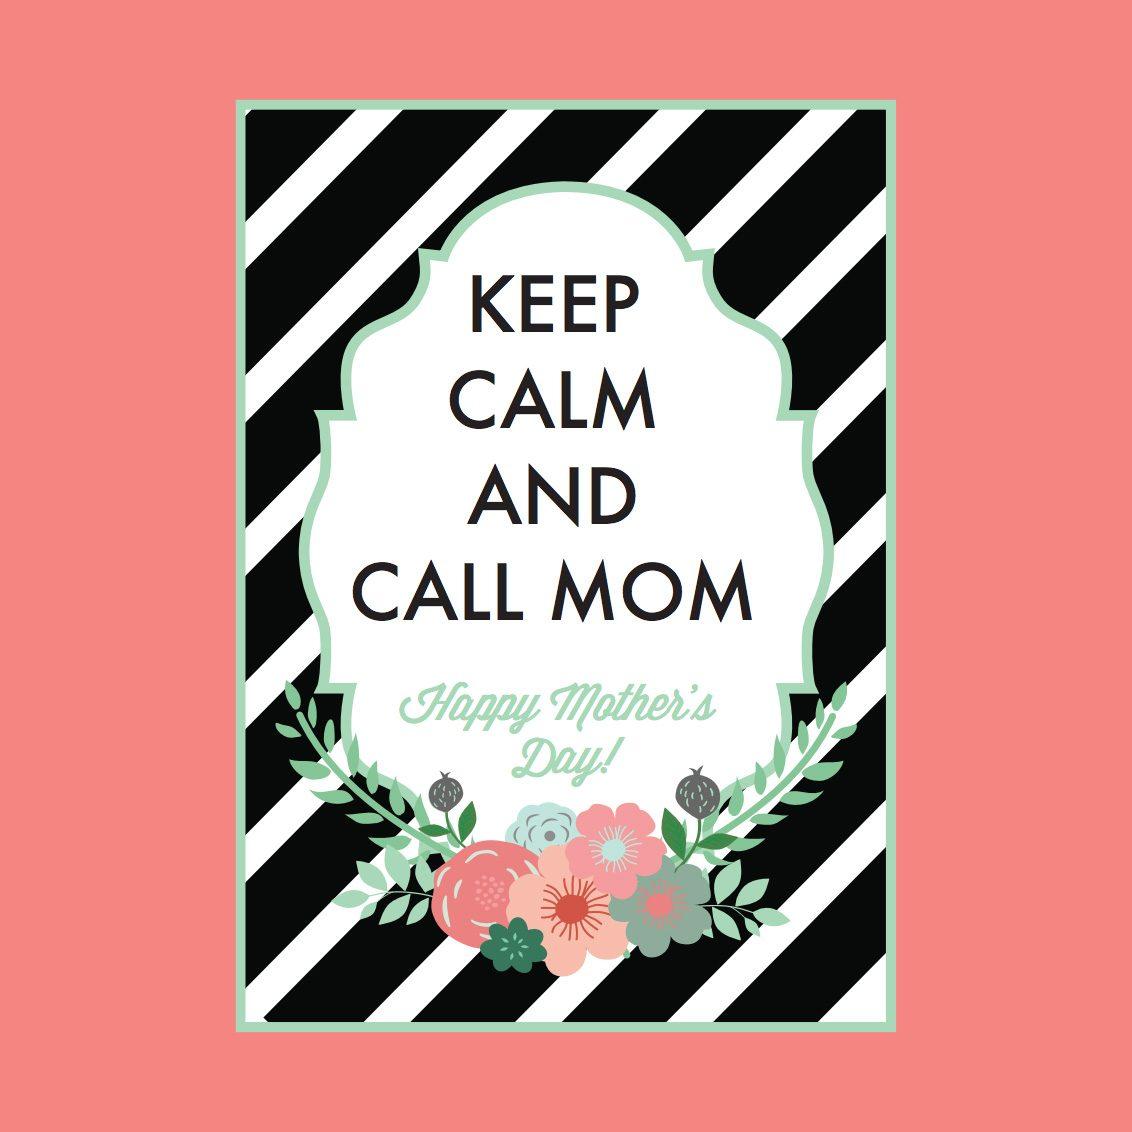 keep calm and call mom card